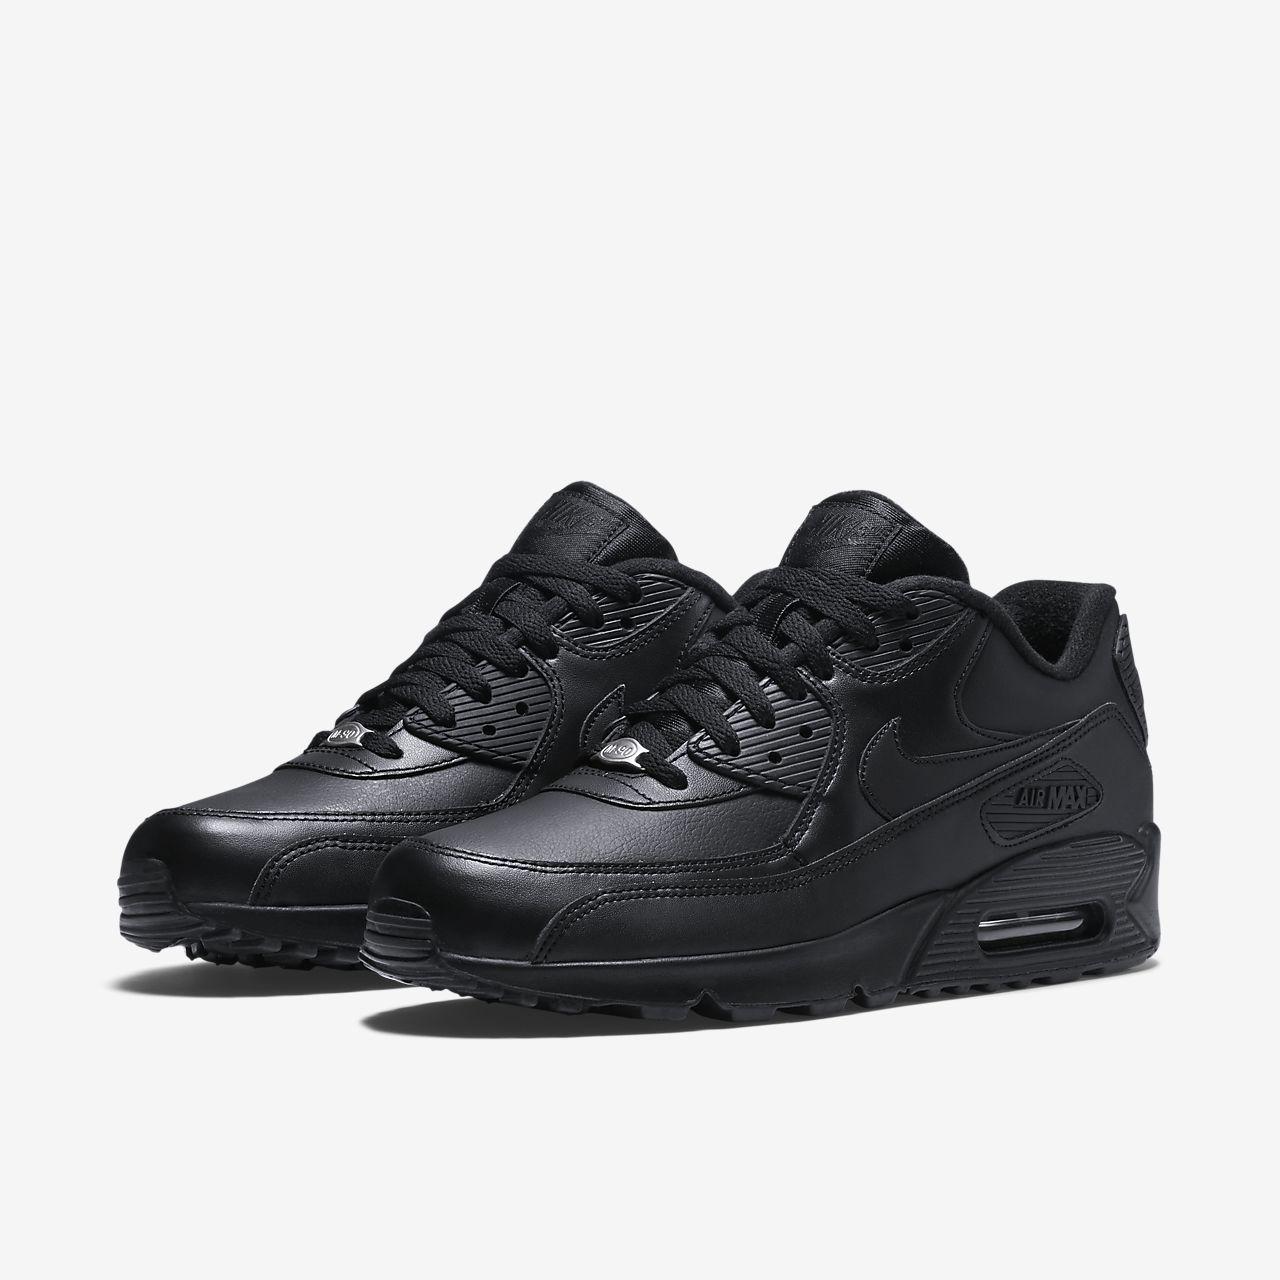 nike air max 90 schoenen heren